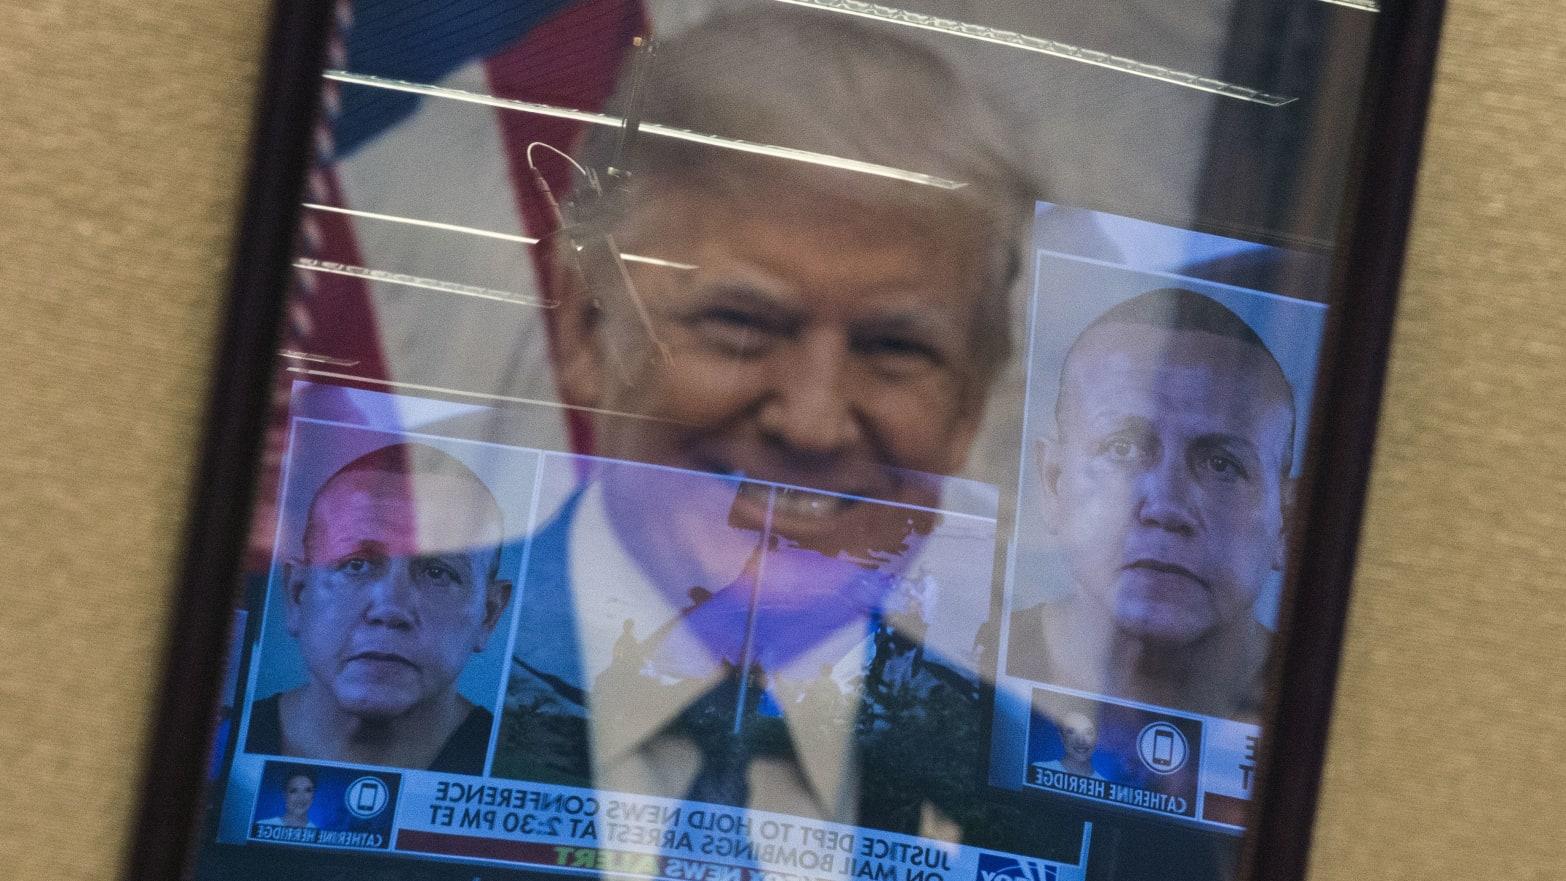 MAGA Bomber Cesar Sayoc's Lawyers Blame Trump, Sean Hannity for His Radicalization